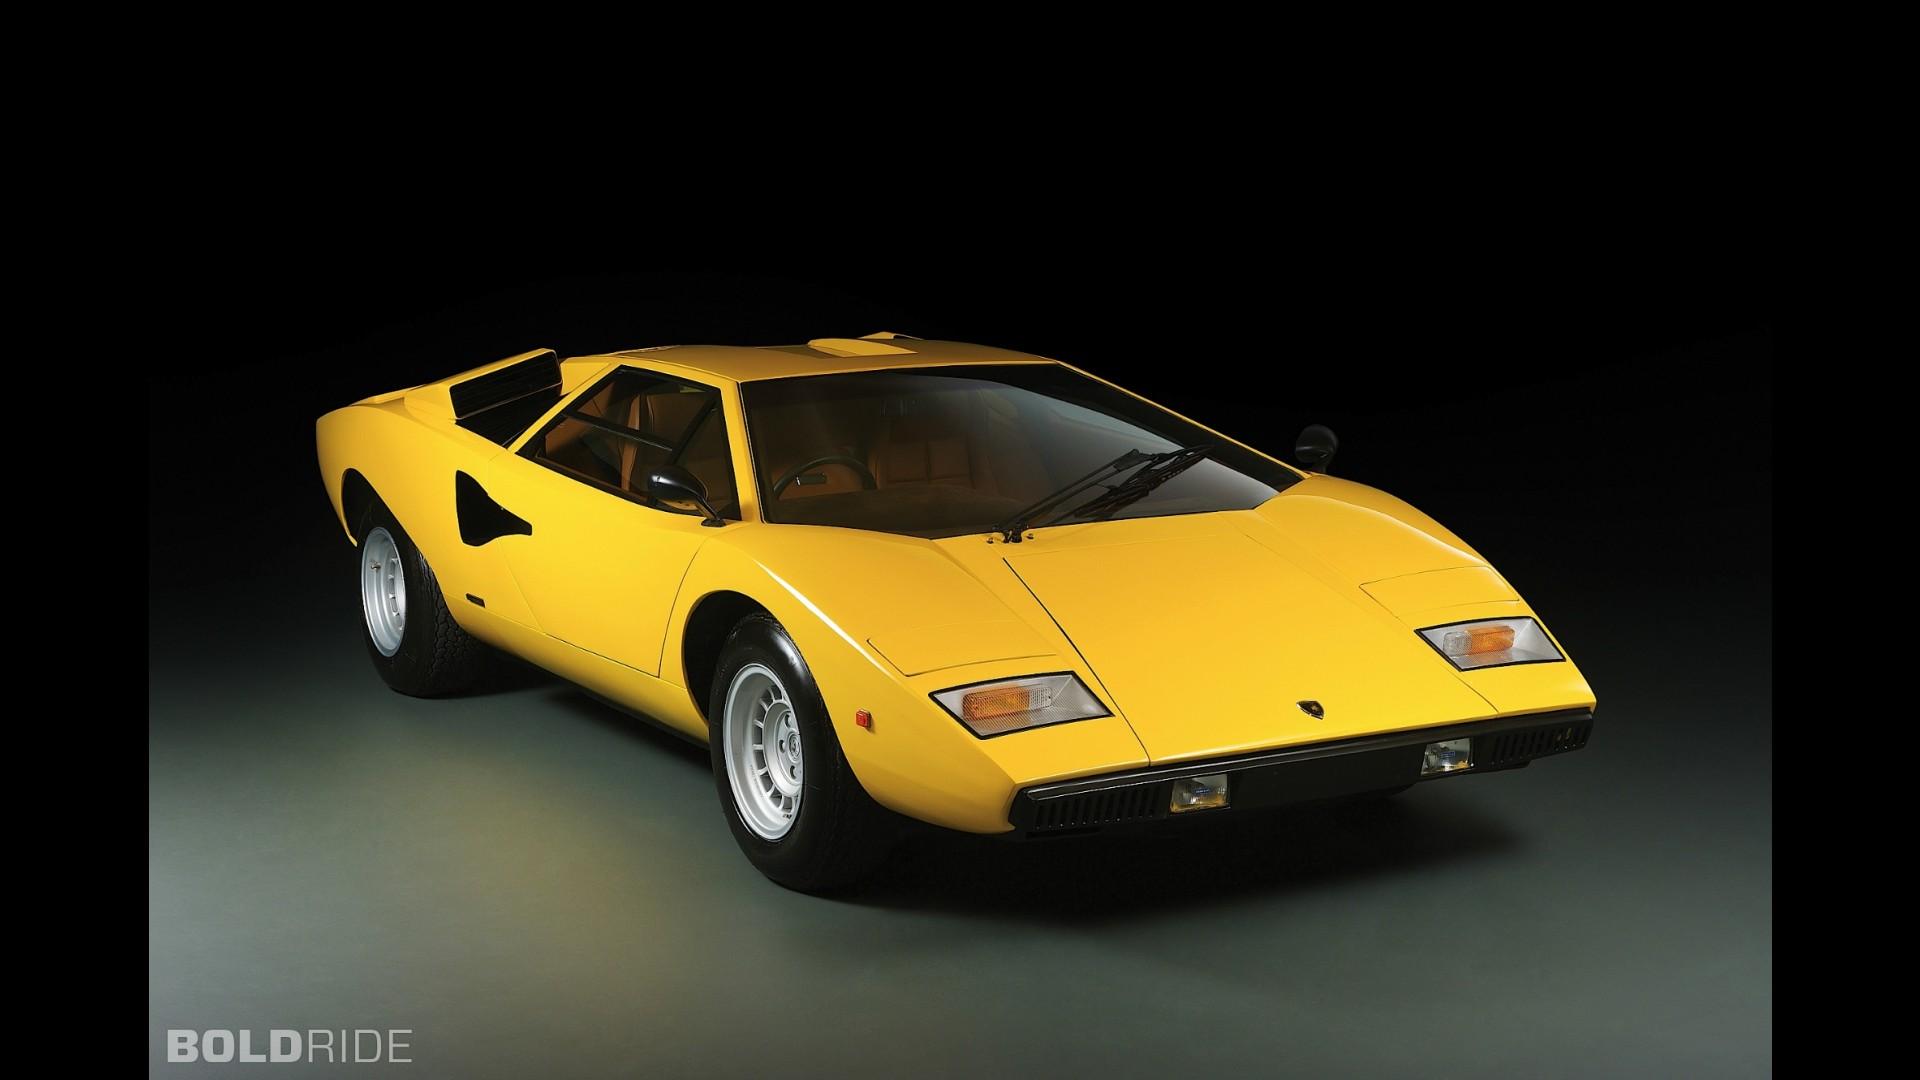 Used Lamborghini Countach Cars For Sale With Pistonheads 10